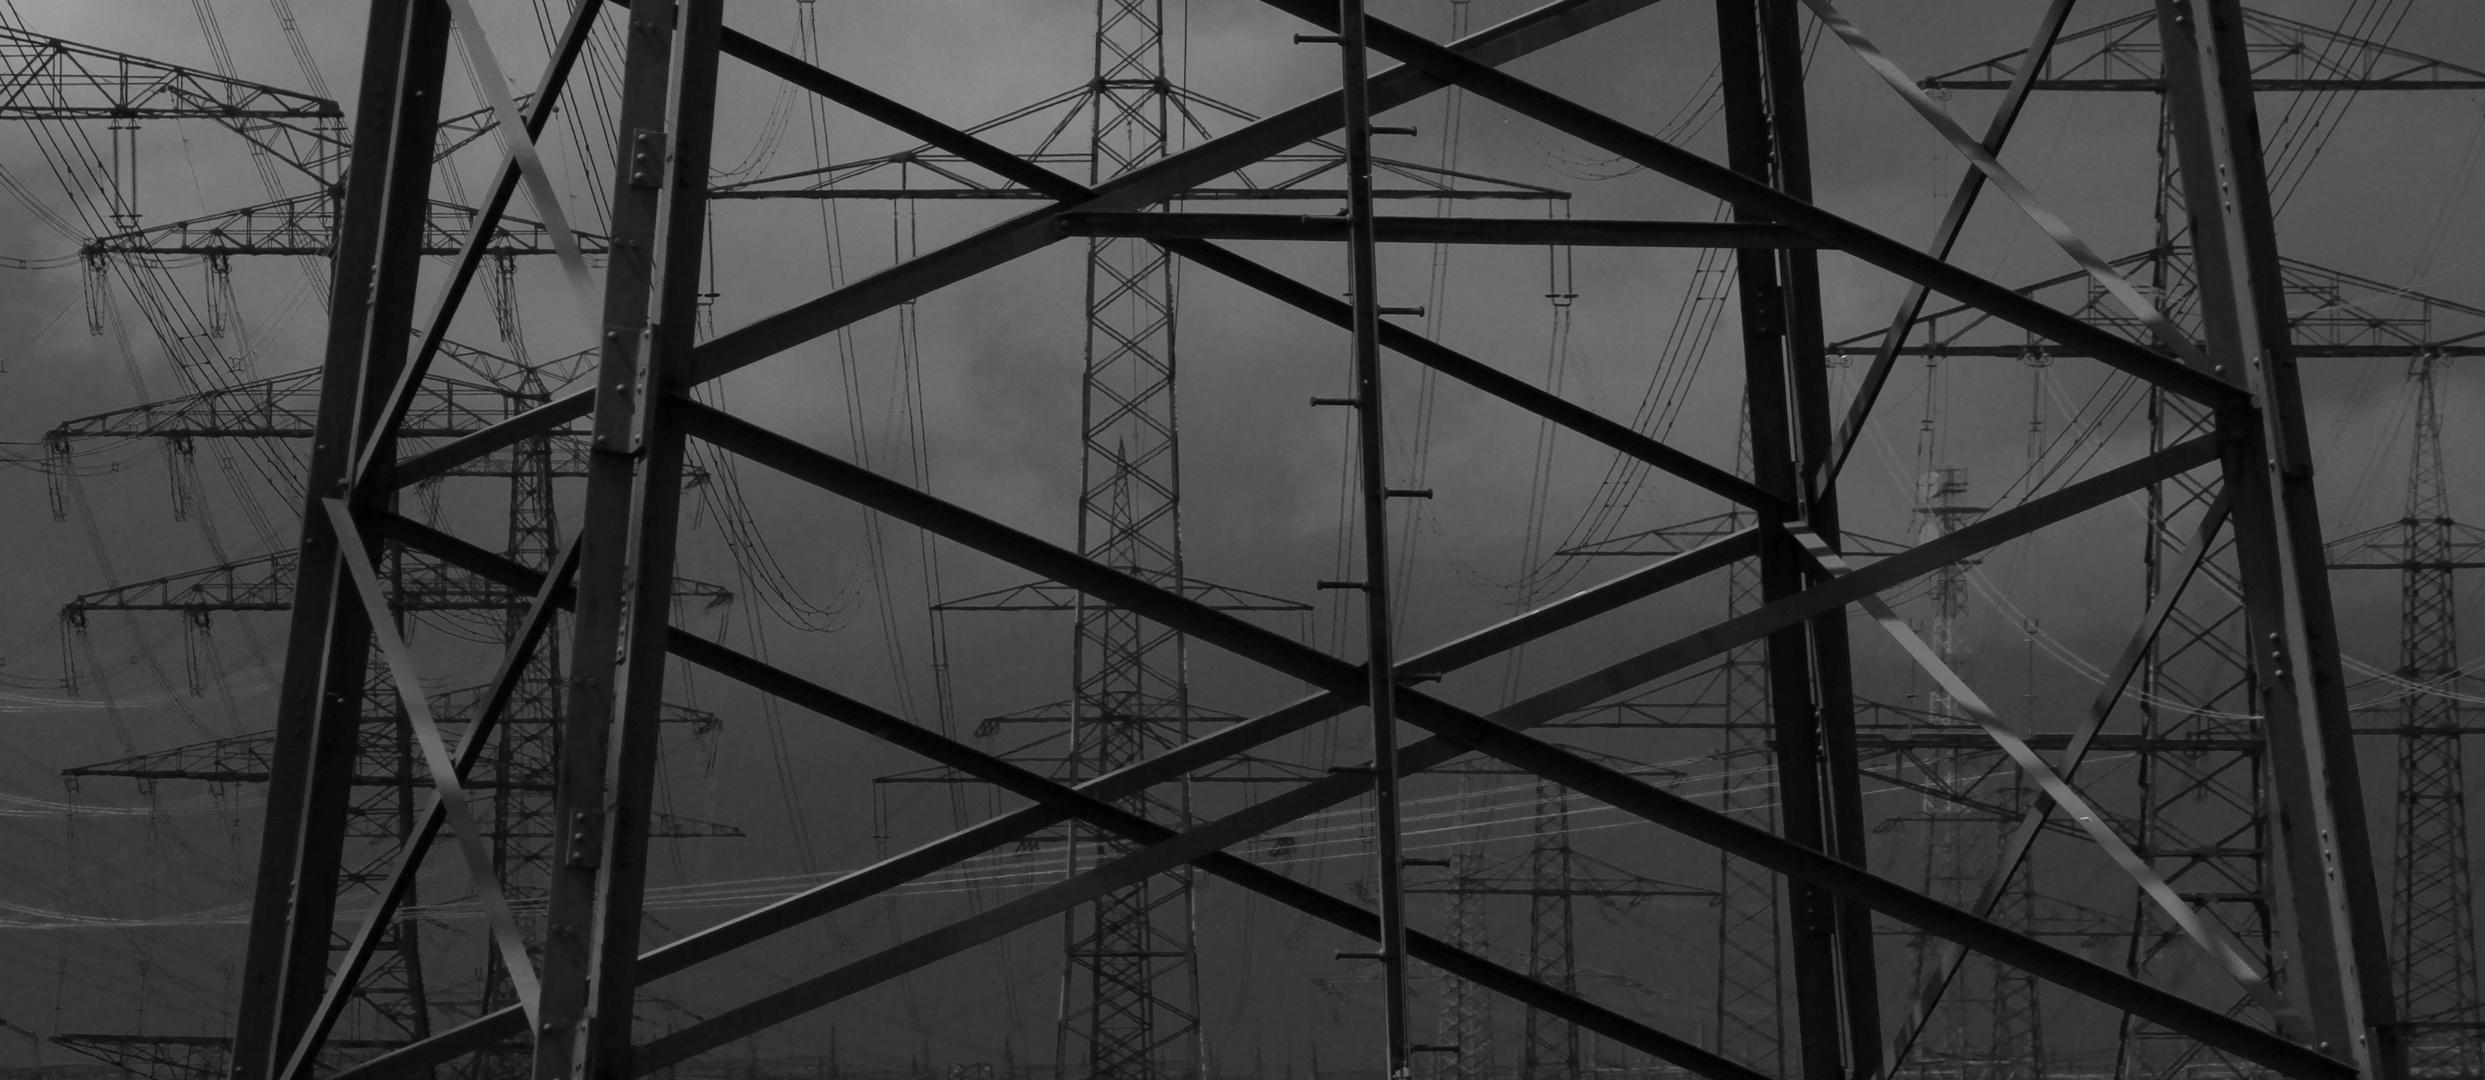 Electric field study